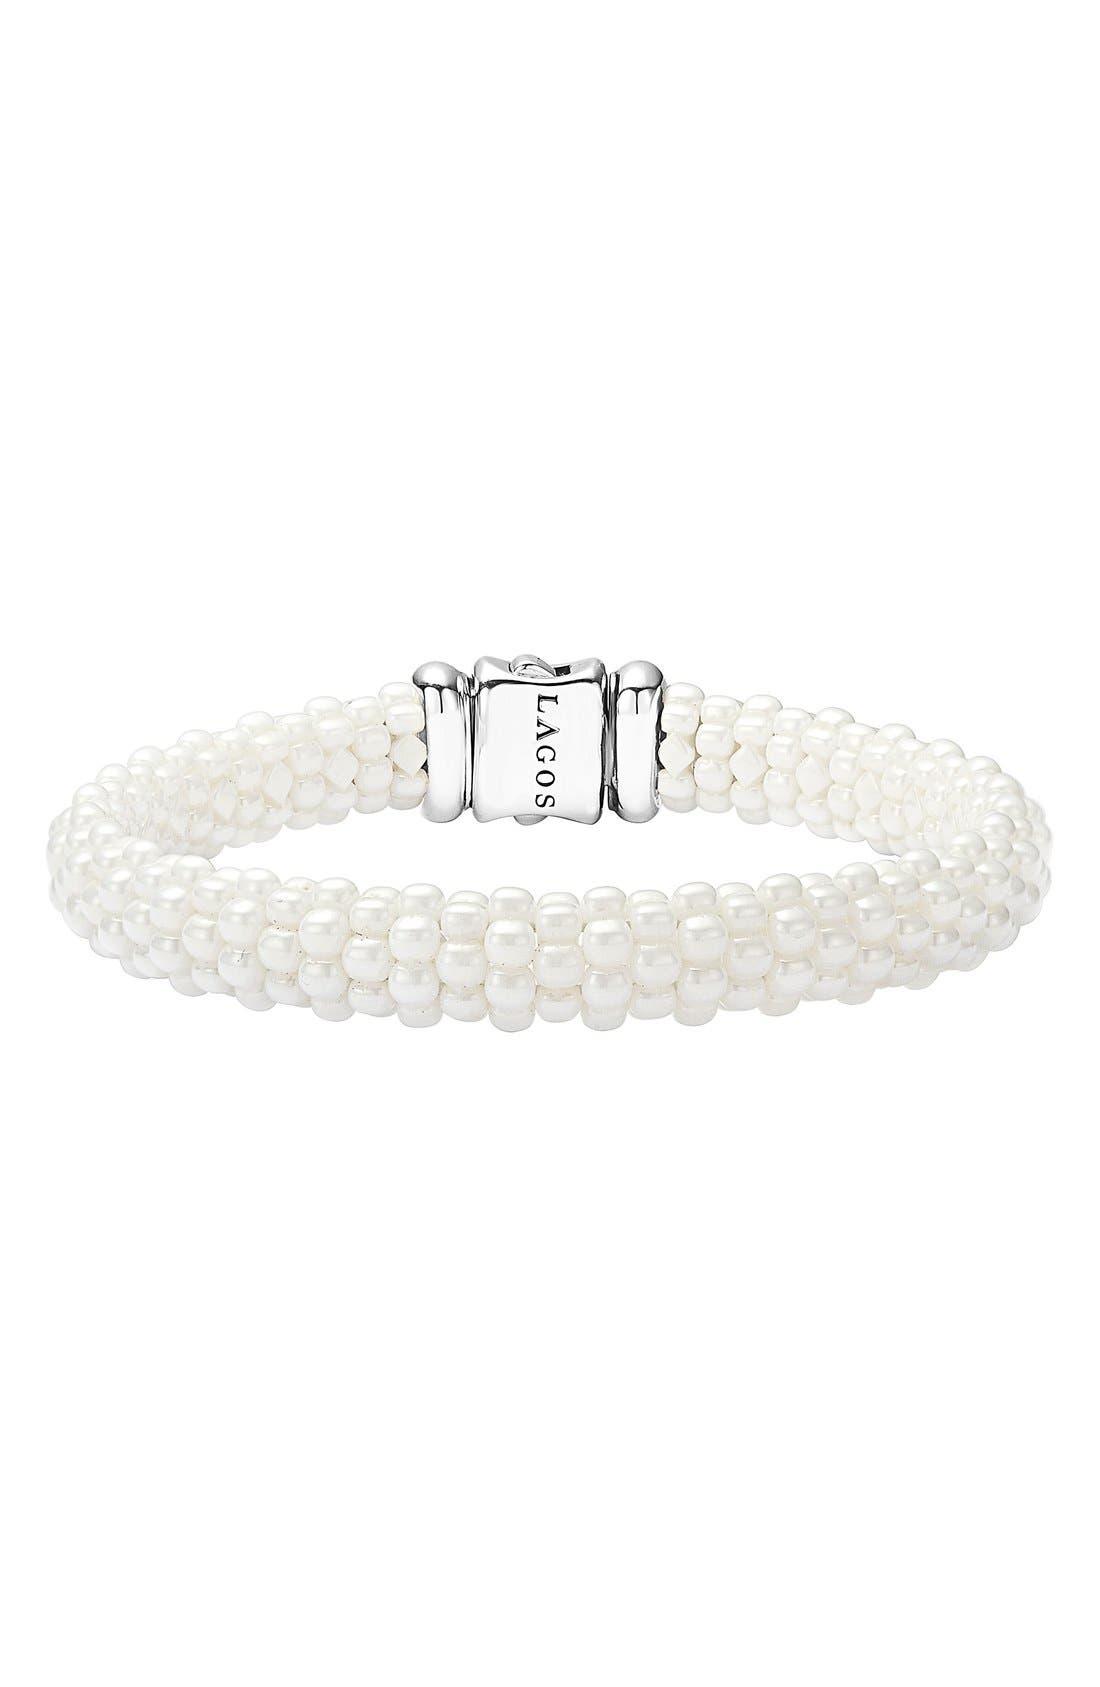 Alternate Image 1 Selected - LAGOS 'White Caviar' Rope Bracelet